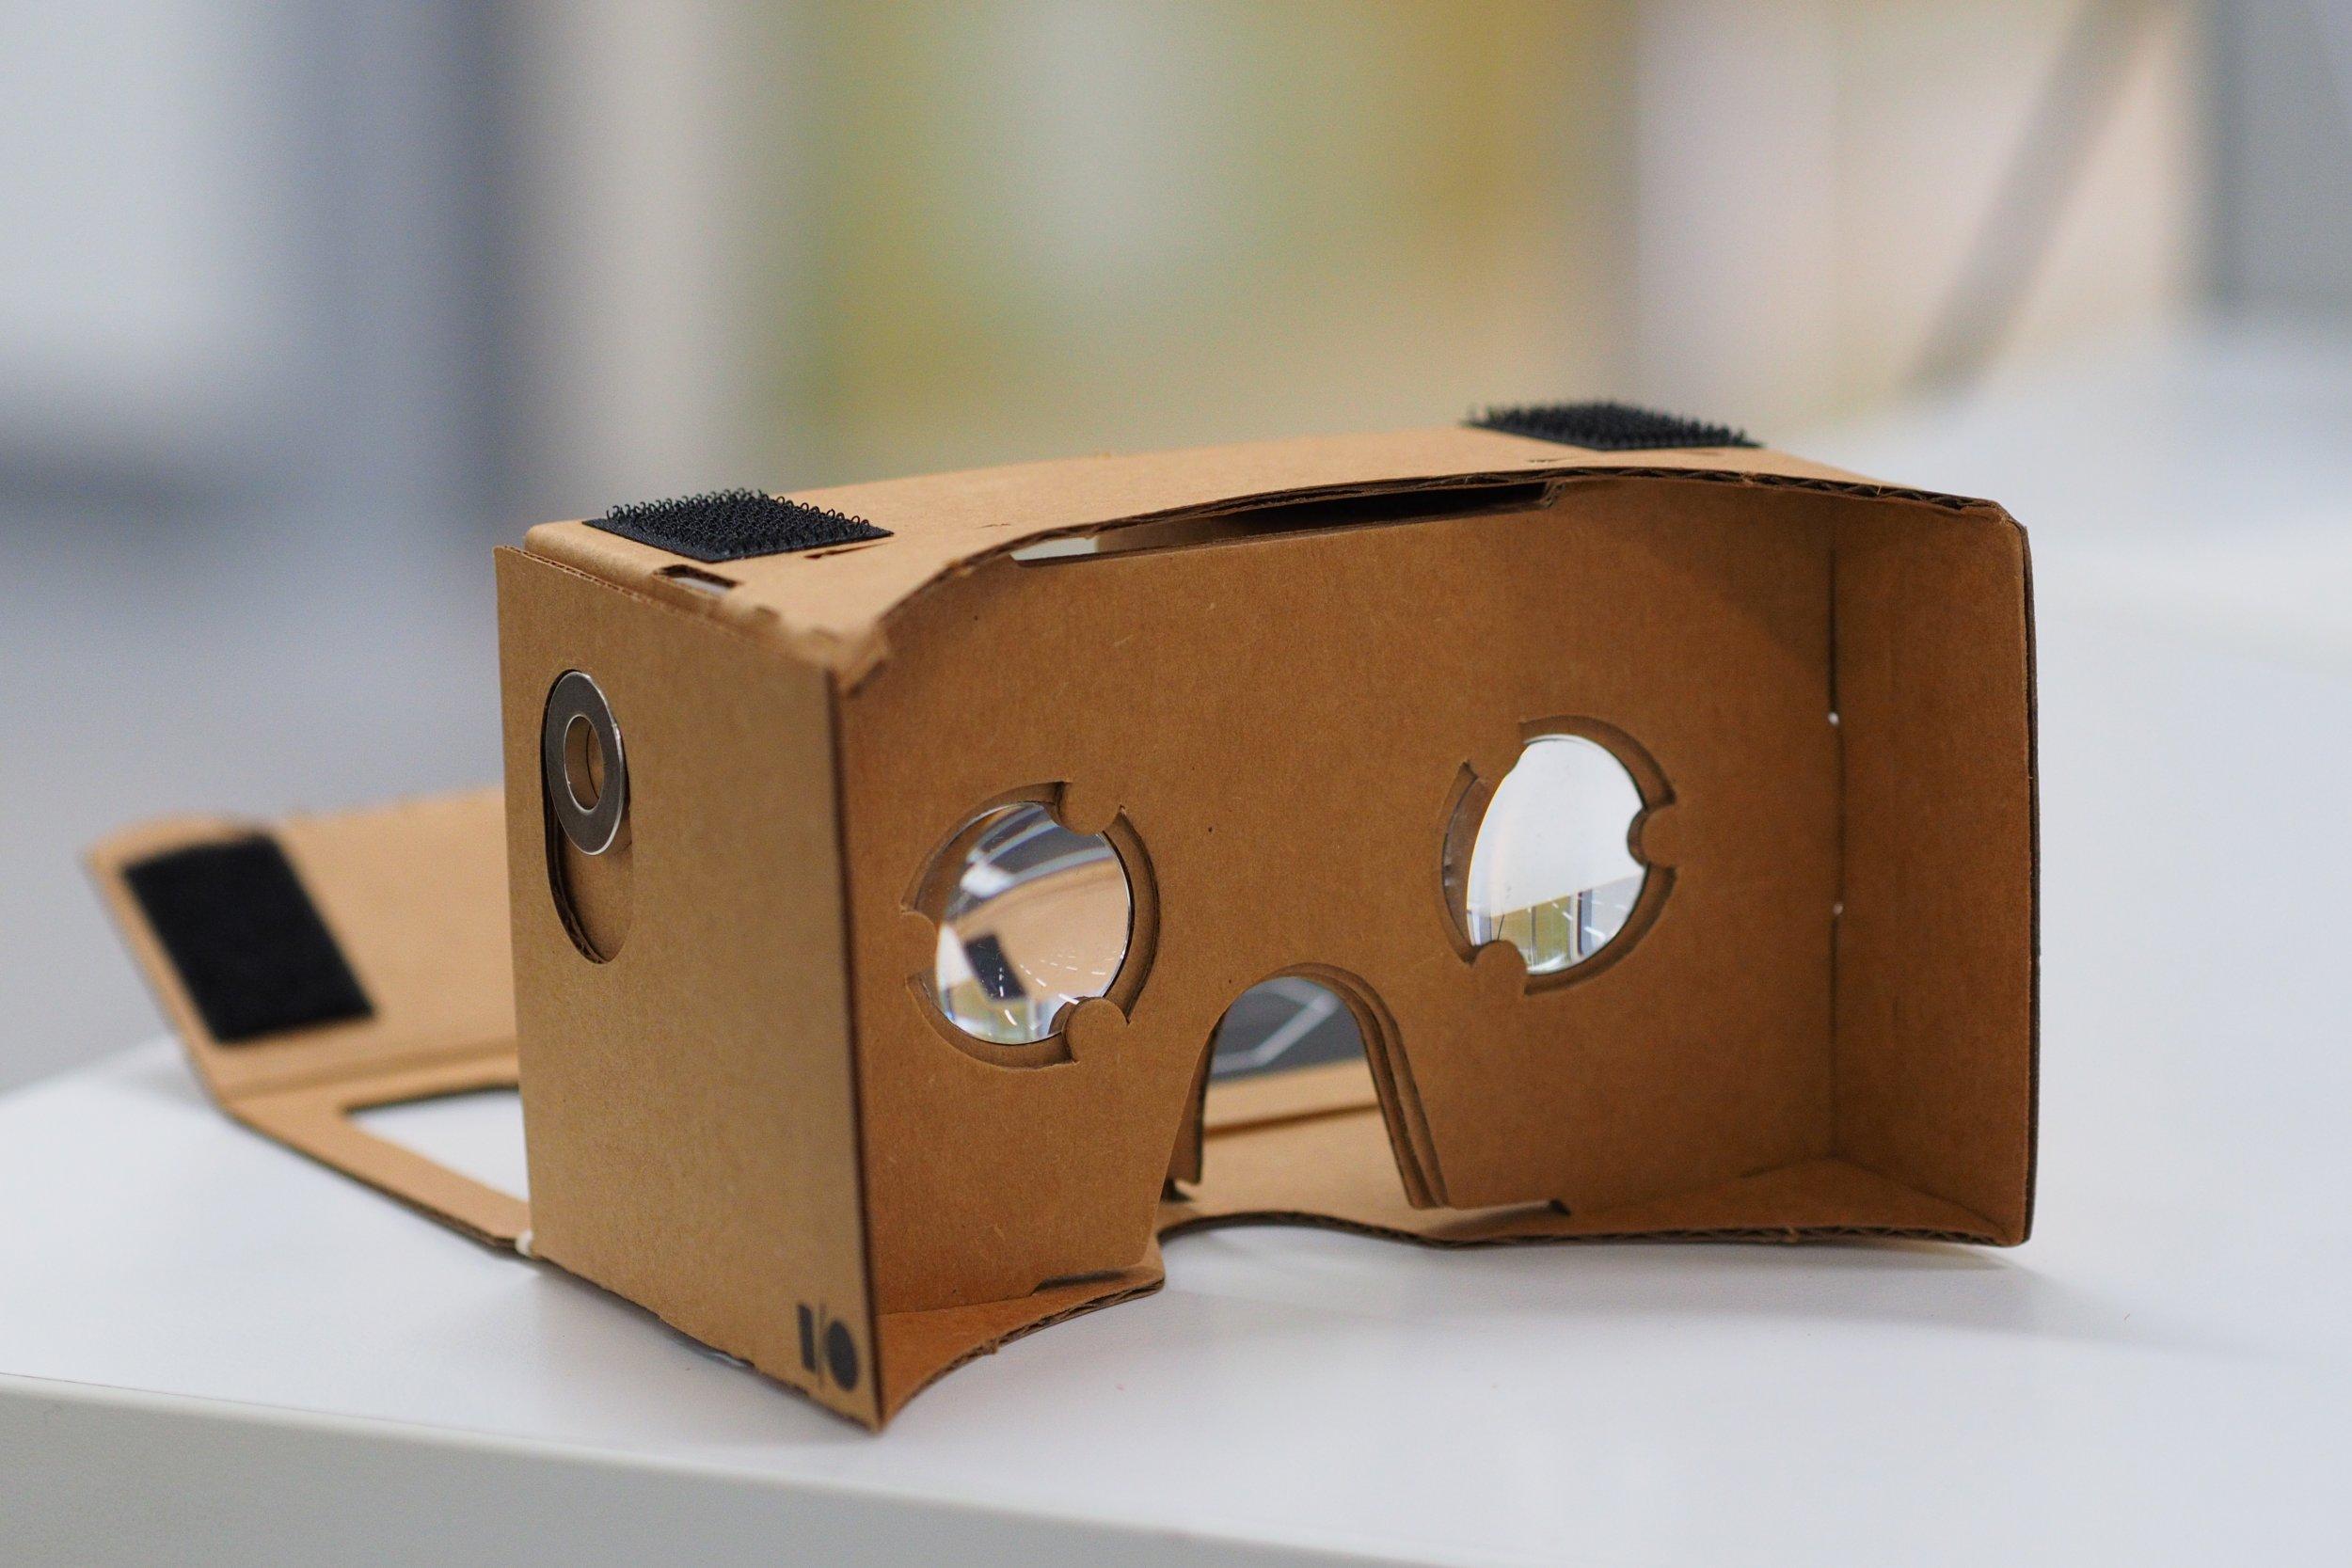 Google virtual reality headset VR cardboard